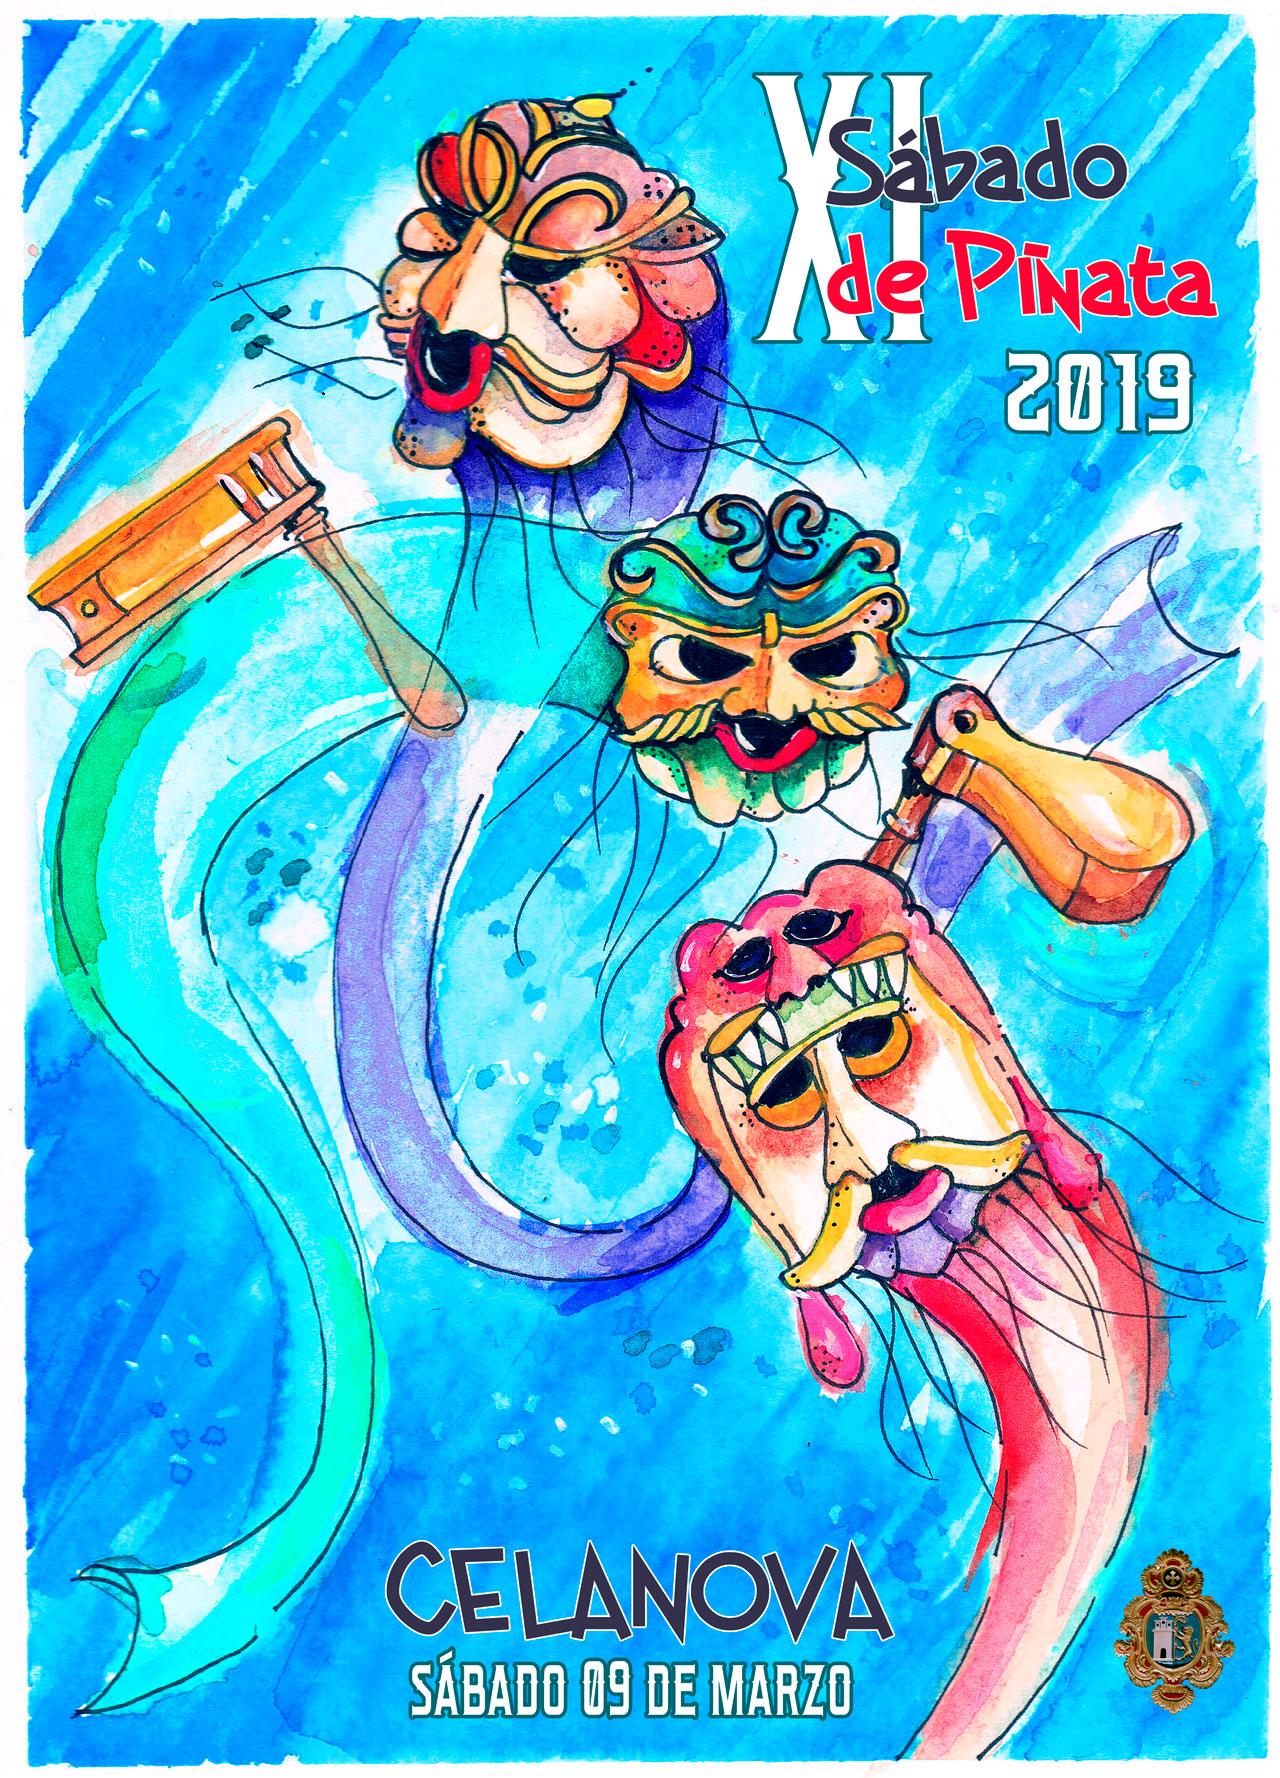 Cartel del XI Sábado de Piñata de Celanova